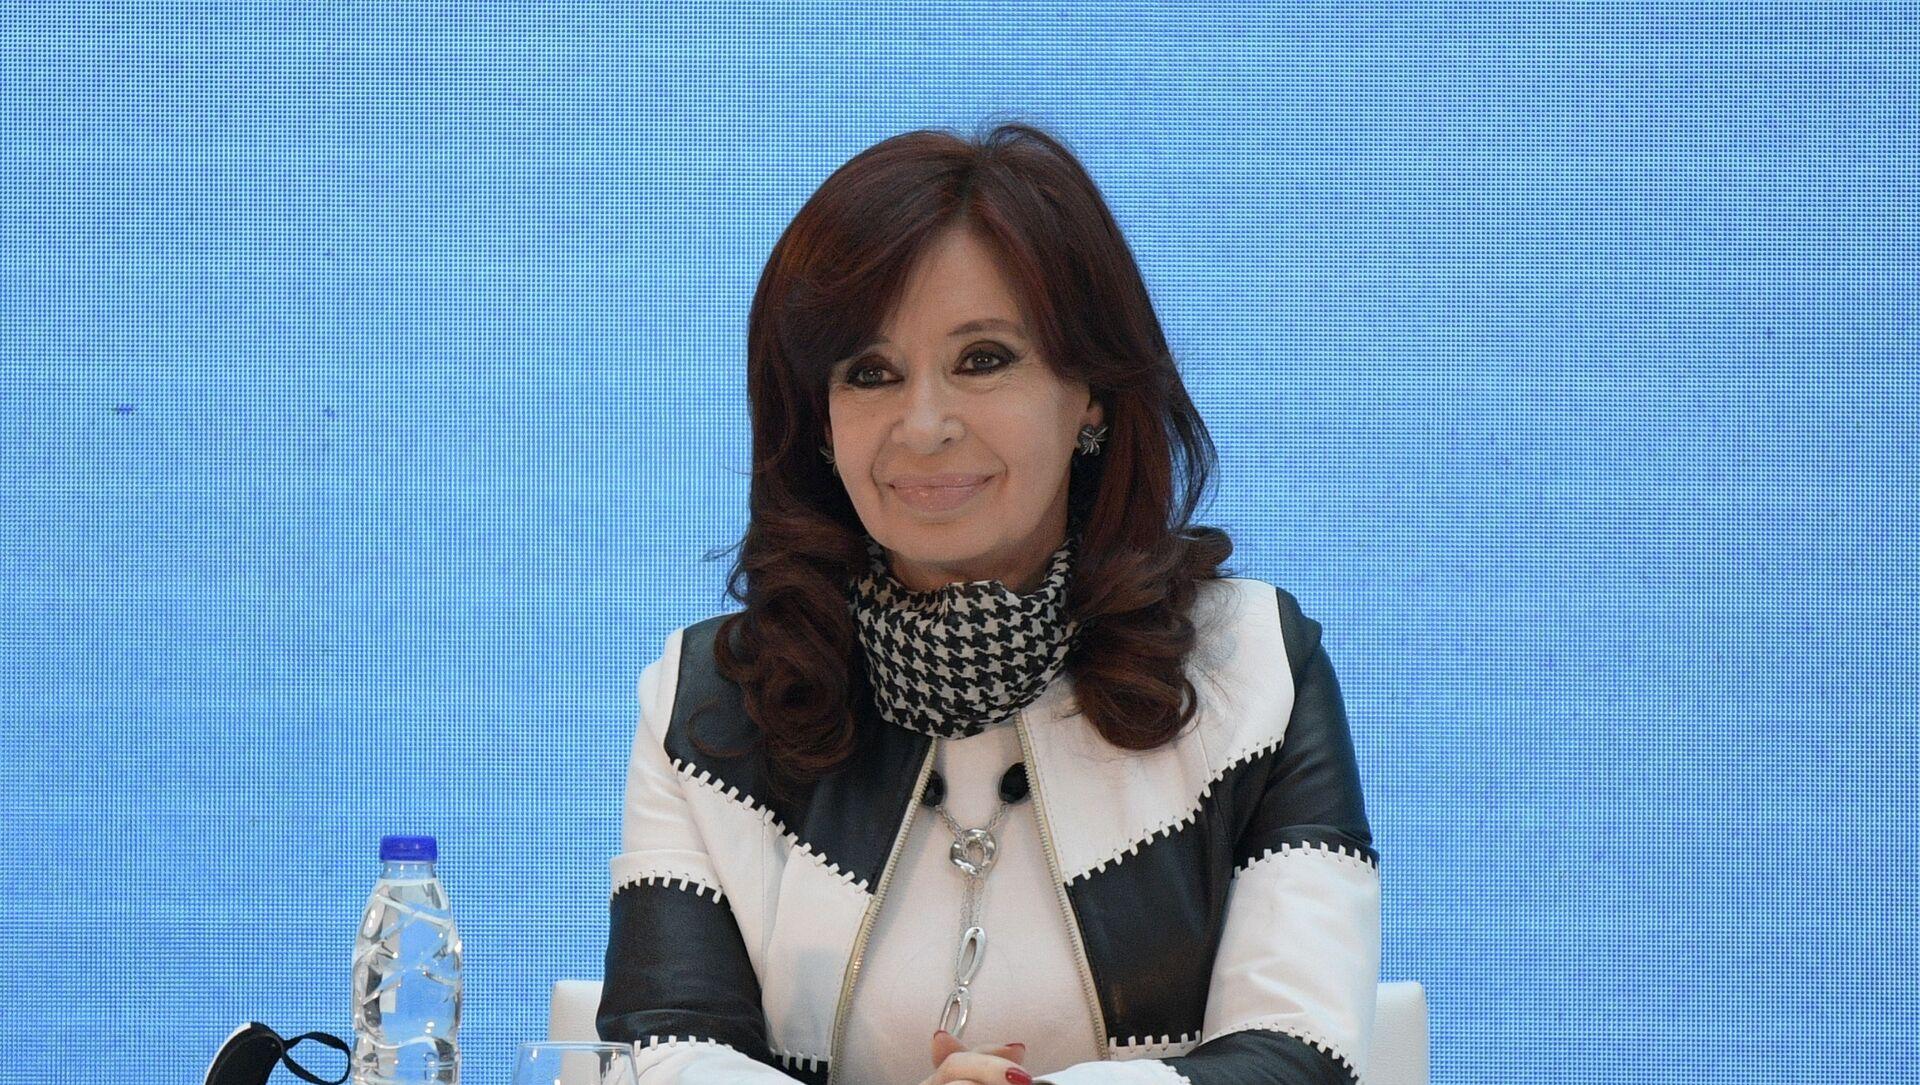 Cristina Fernández de Kirchner, vicepresidenta de Argentina - Sputnik Mundo, 1920, 24.11.2020